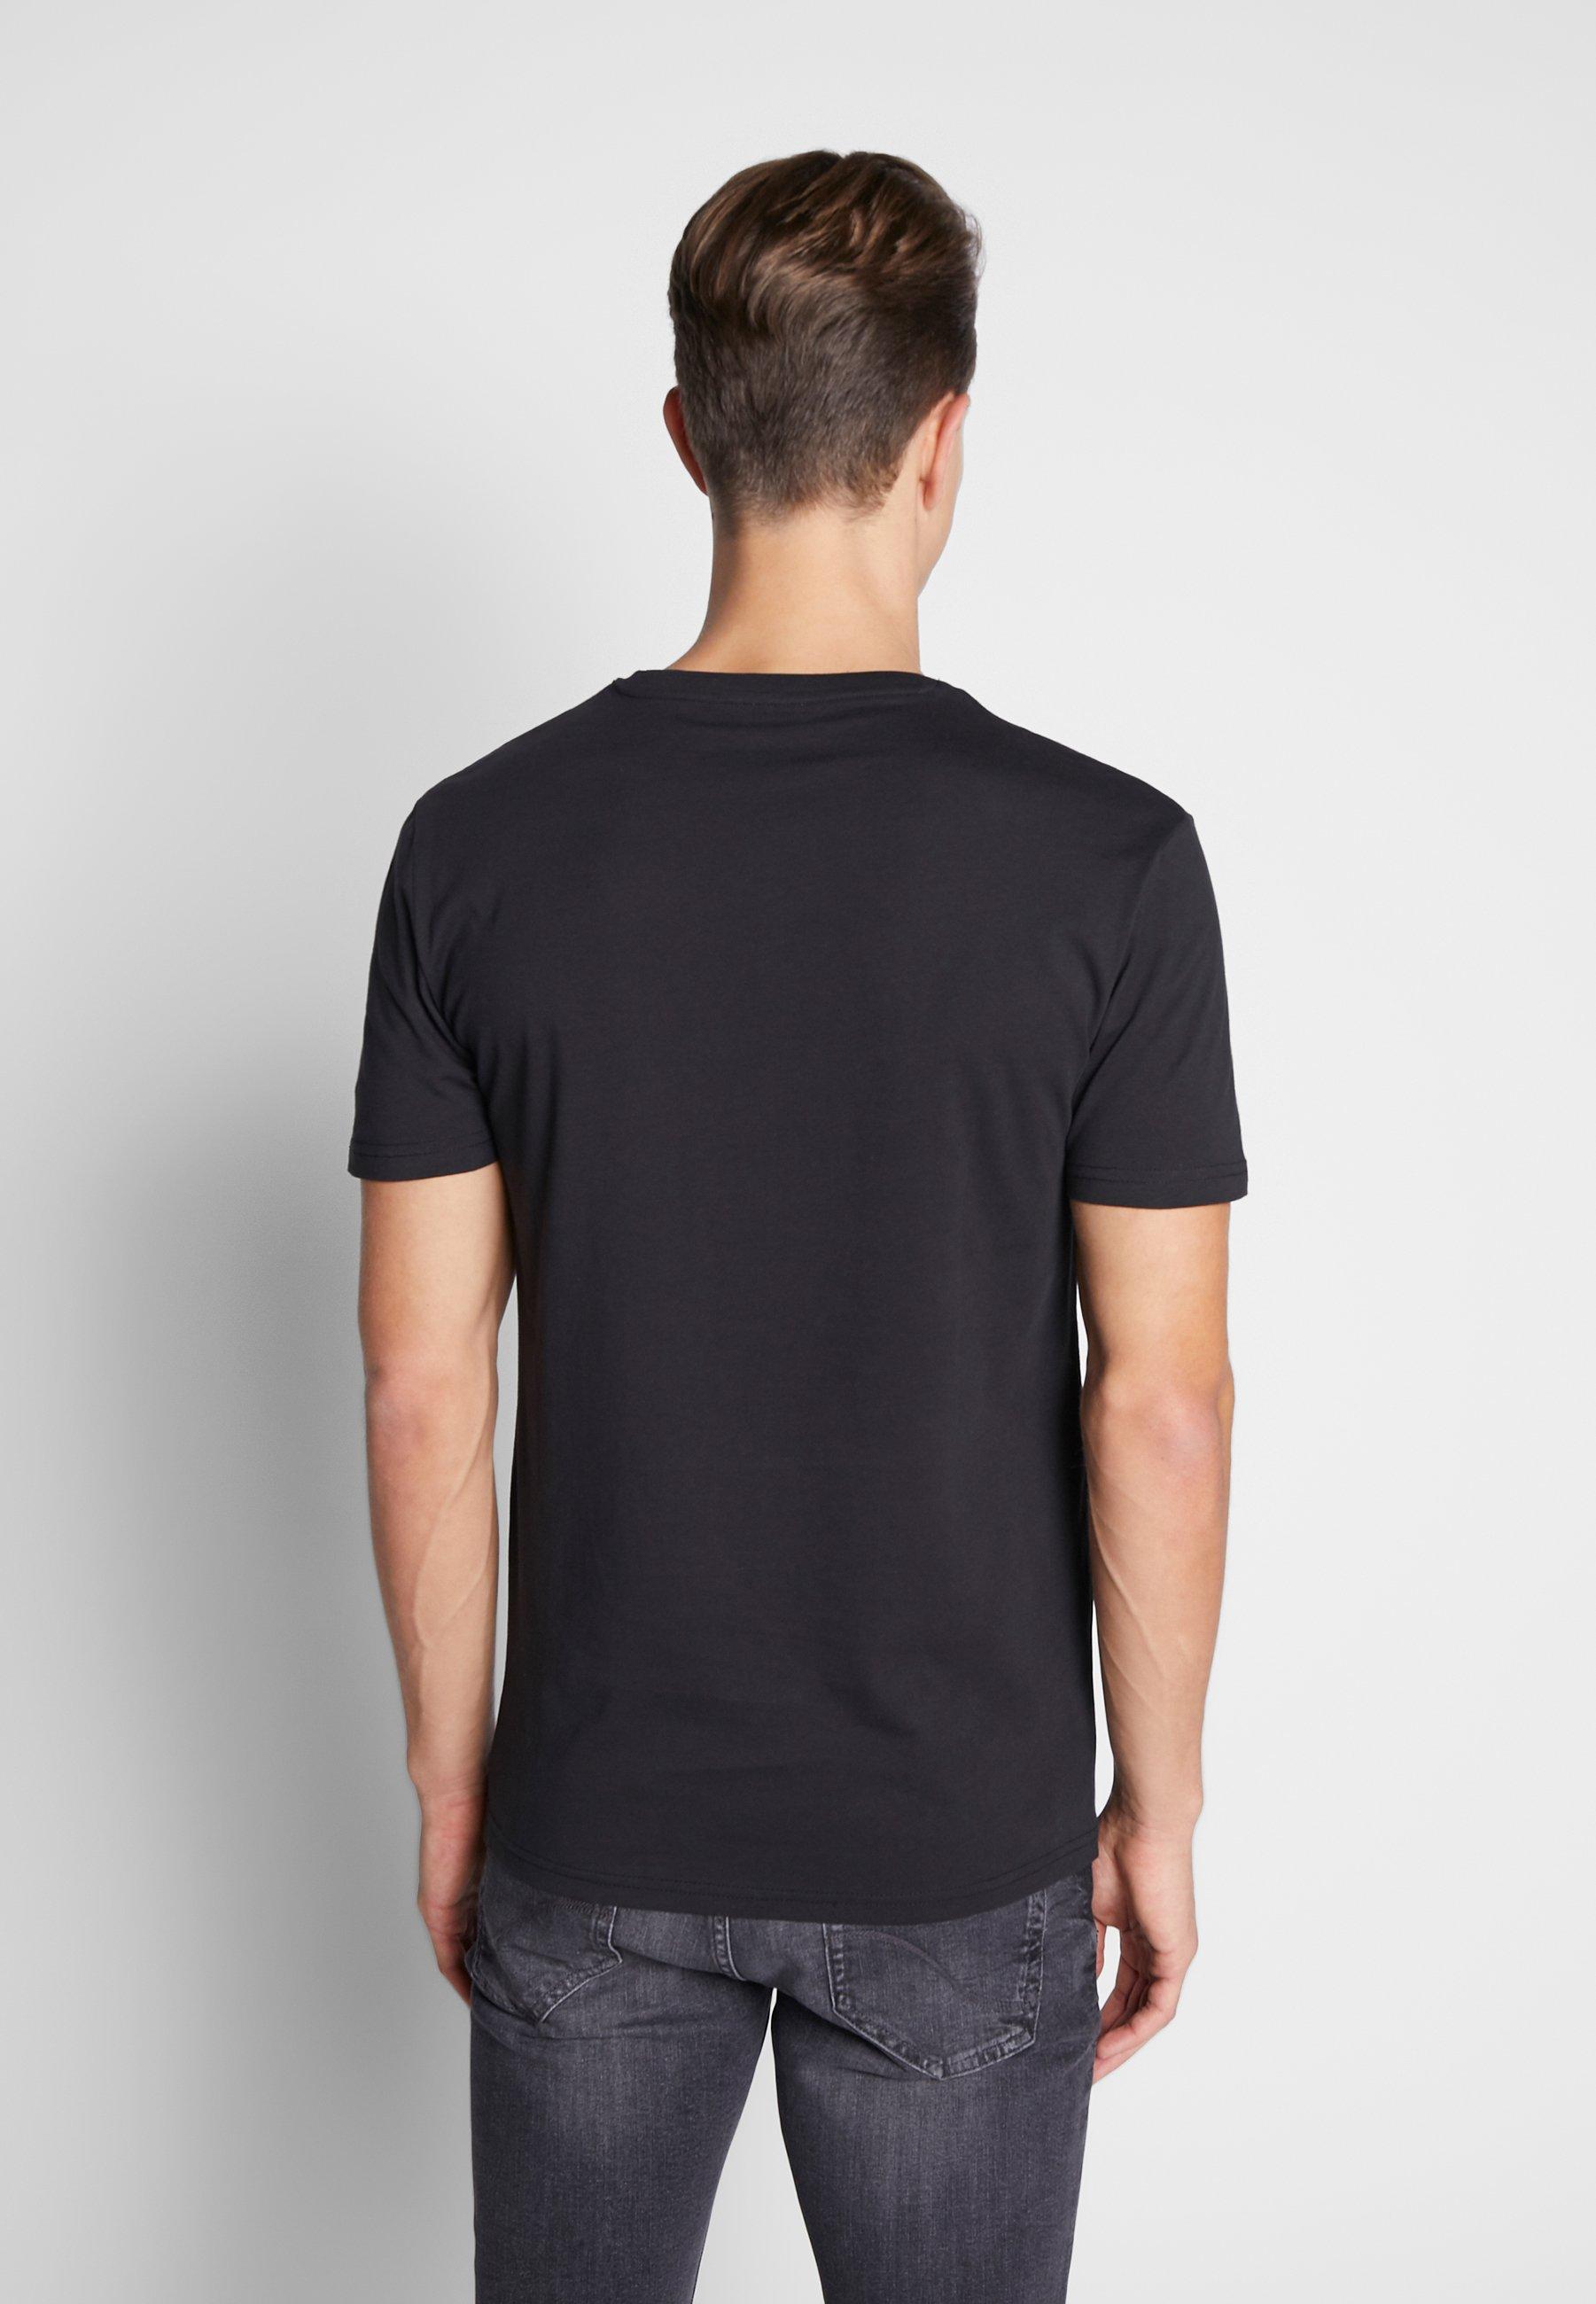 Pier One Print T-shirt - black QzZAg